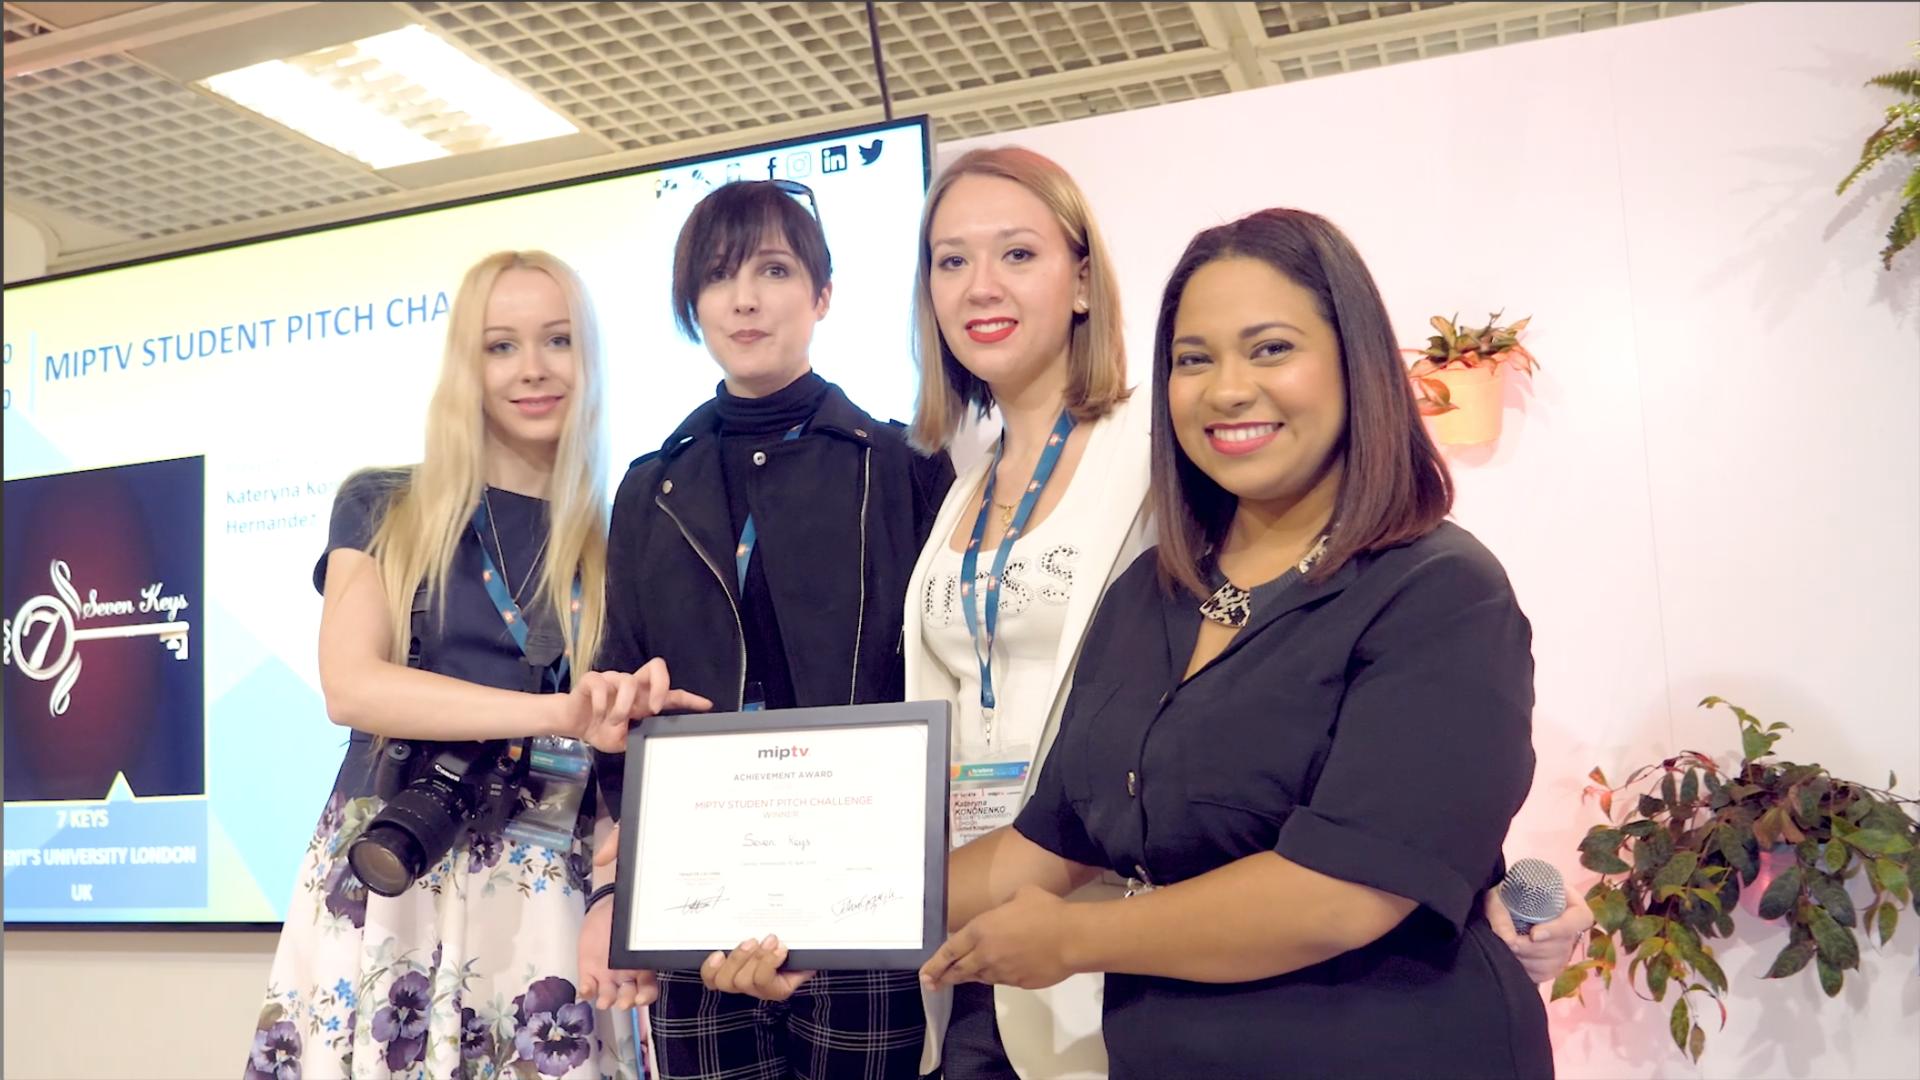 Seven Keys : le groupe gagnant du Student Pitch Challenge 2019